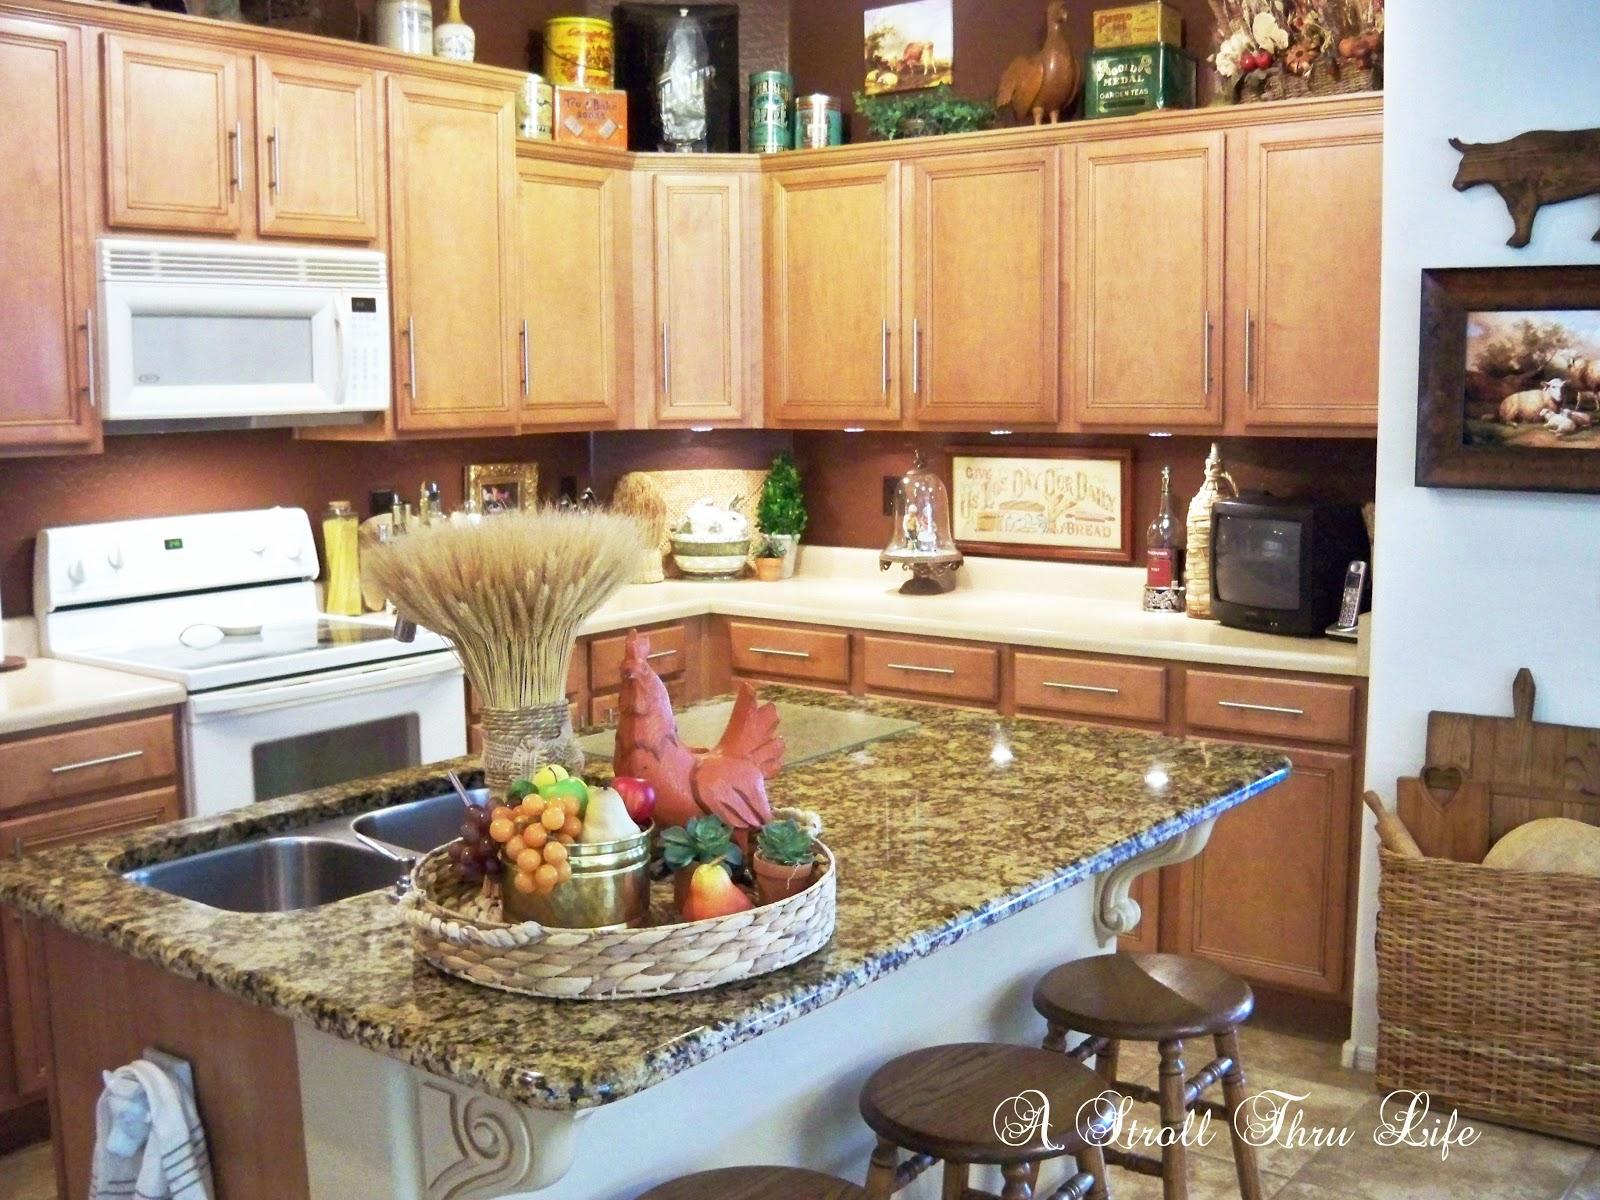 Create inviting decor for the kitchen